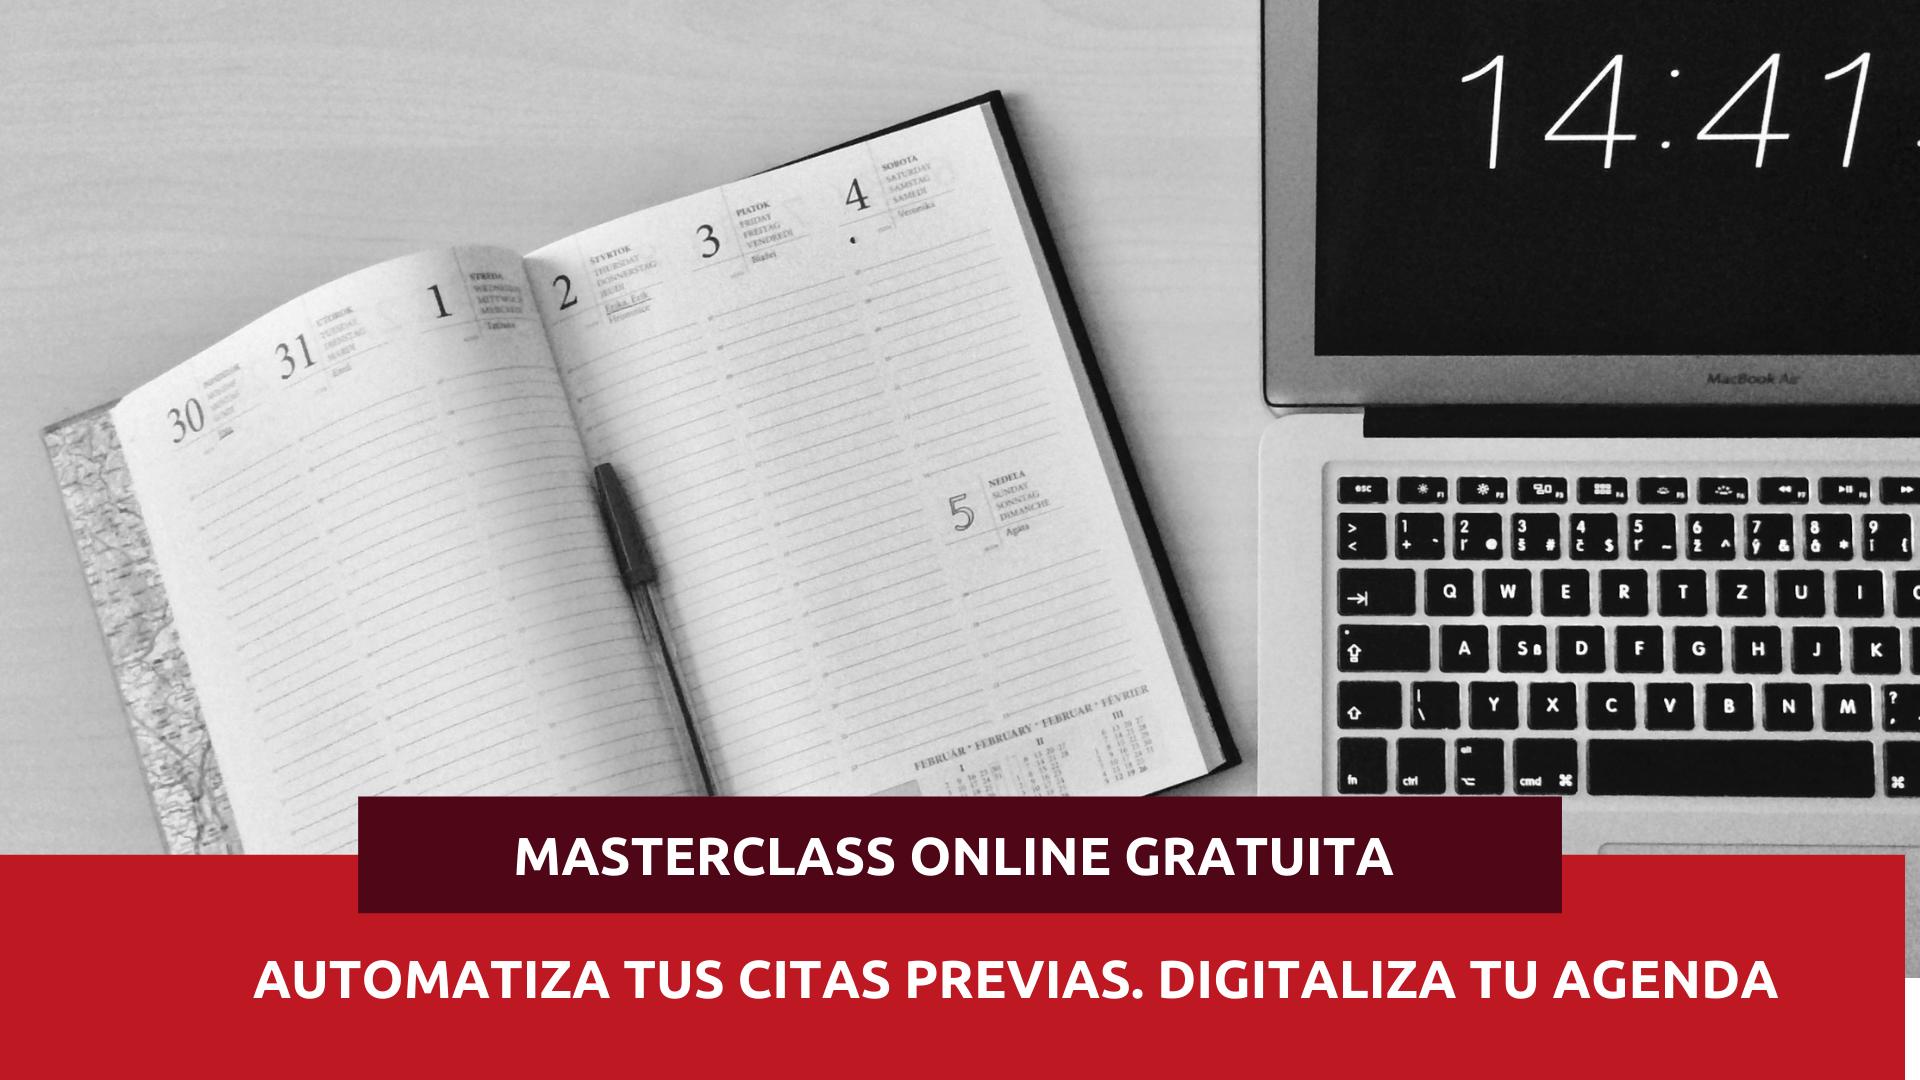 Masterclass agenda digital